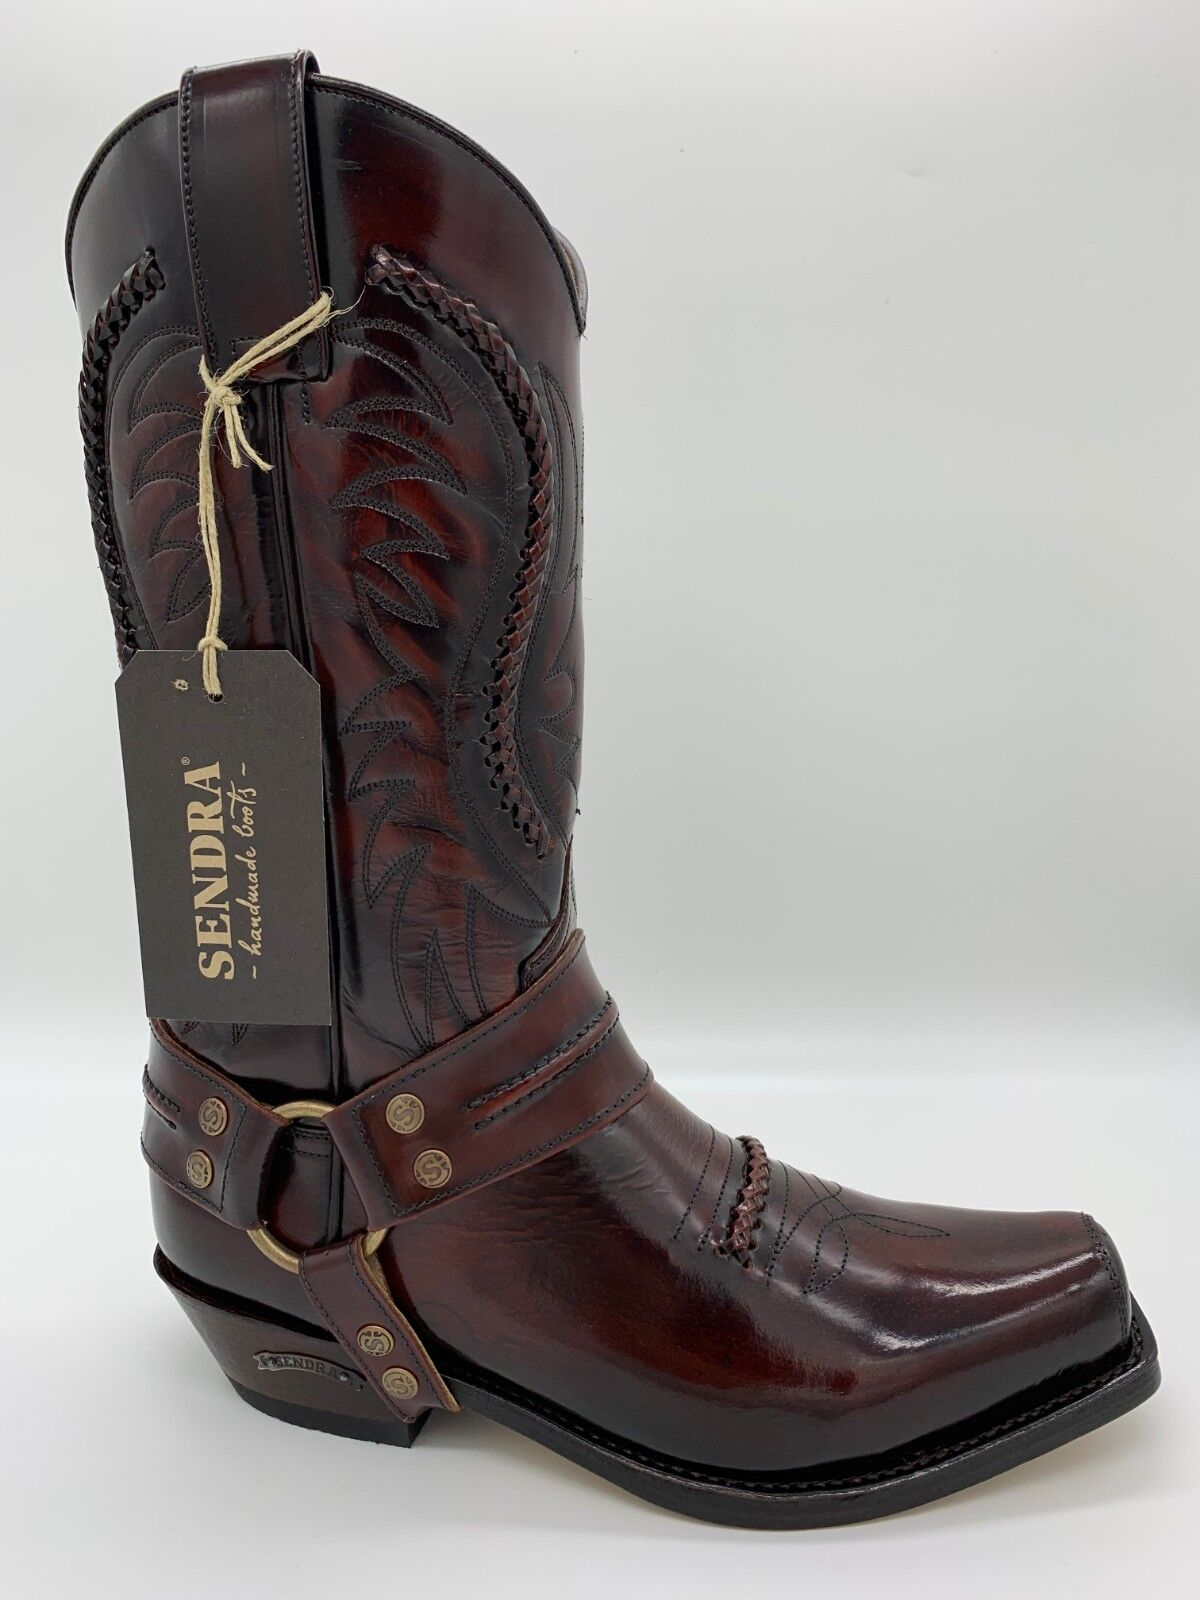 Sendra Stiefel Western Cowboystiefel Biker Boots Exklusiv & Limitiert